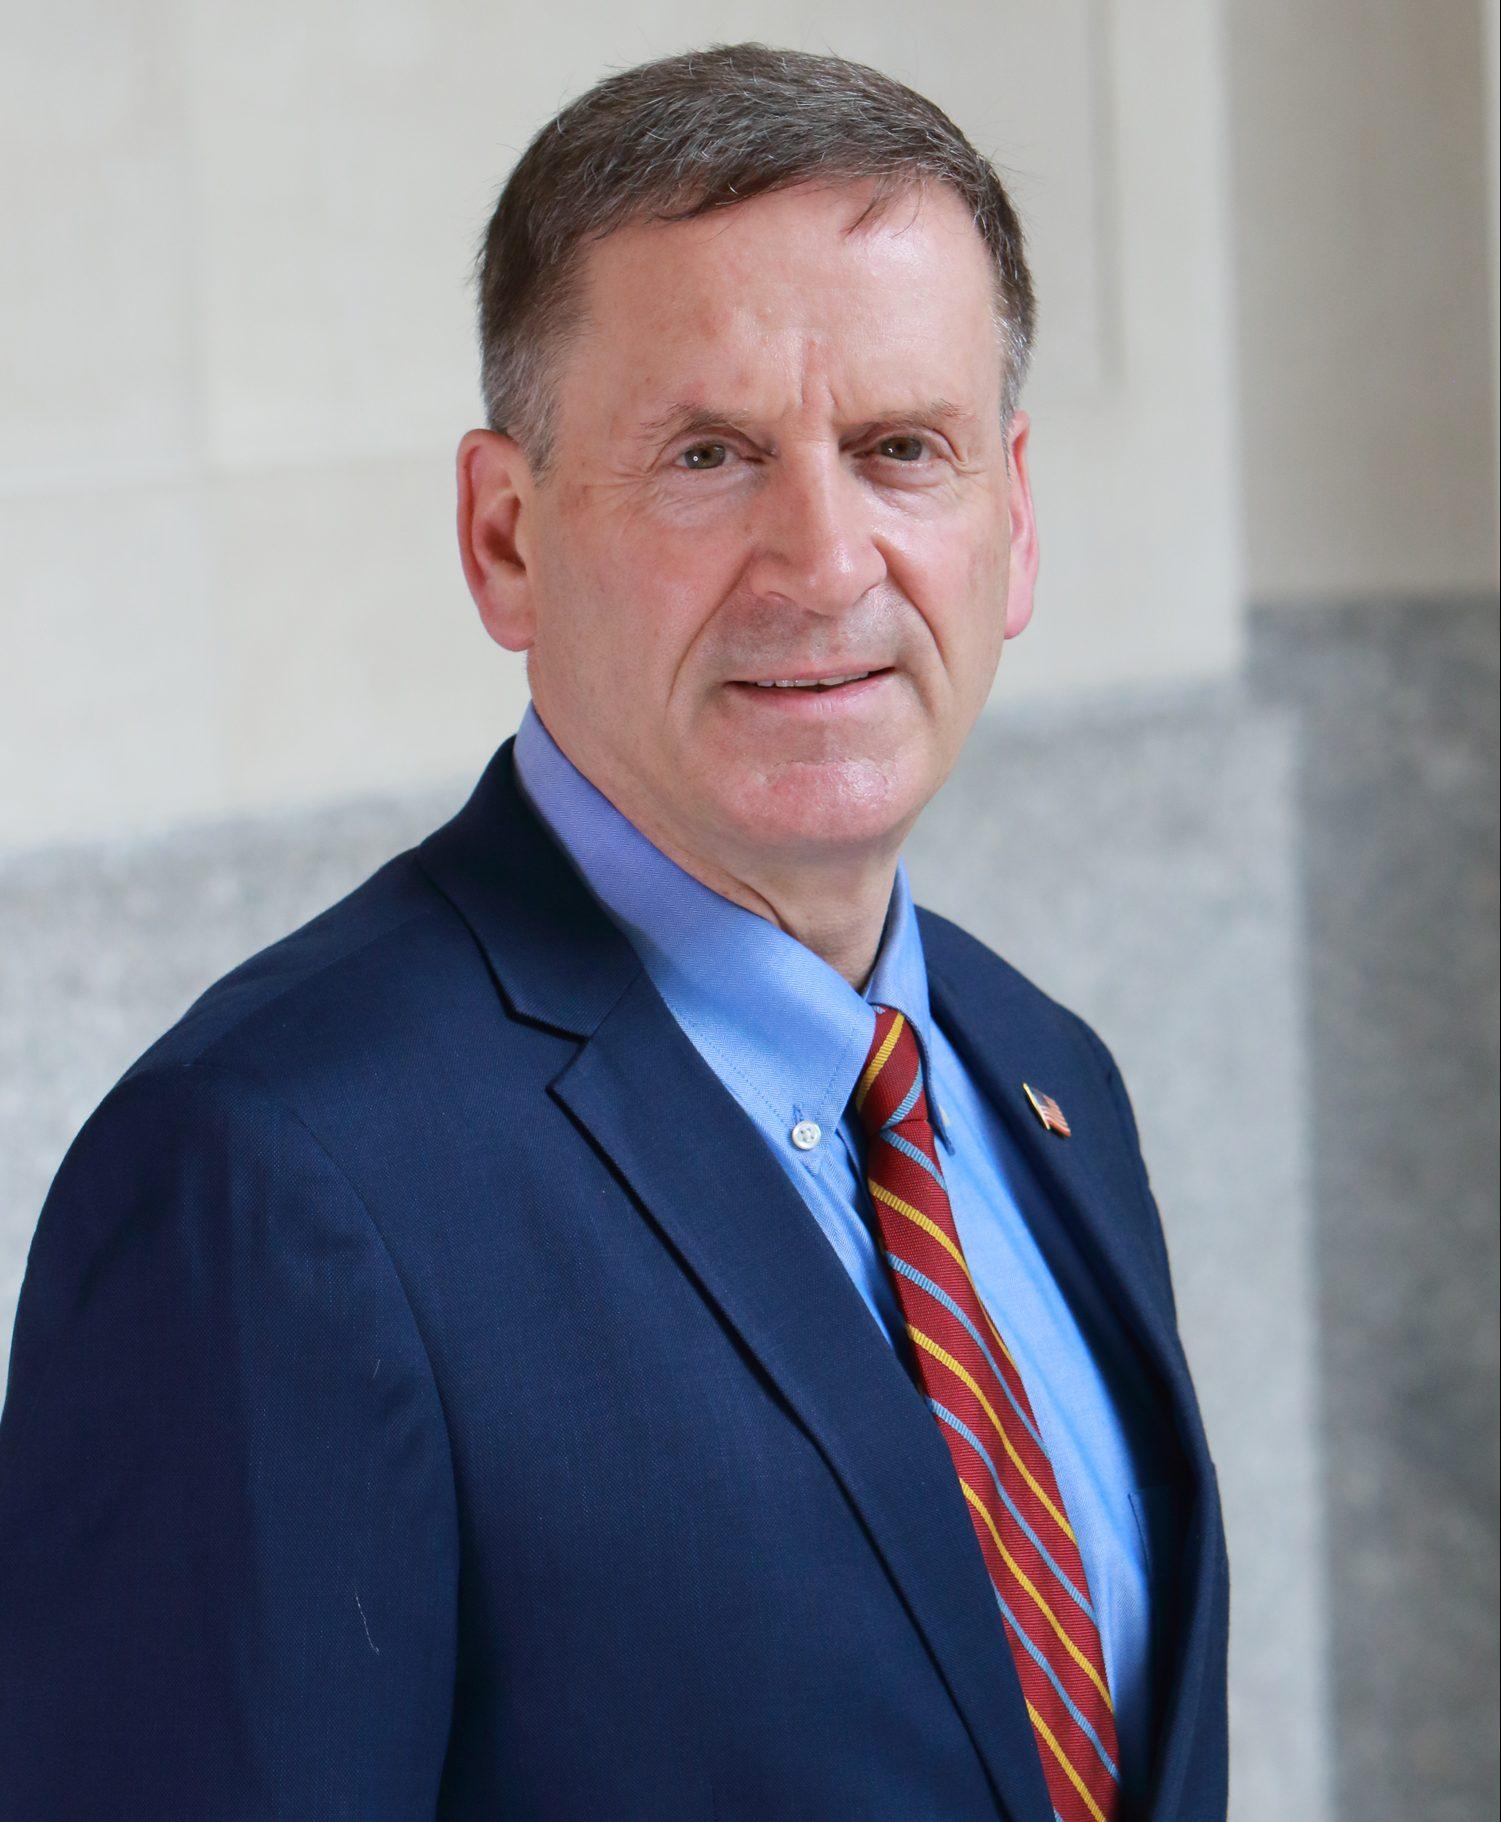 Ambassador Mark Green e1628183521312 - Hon. Mark Green